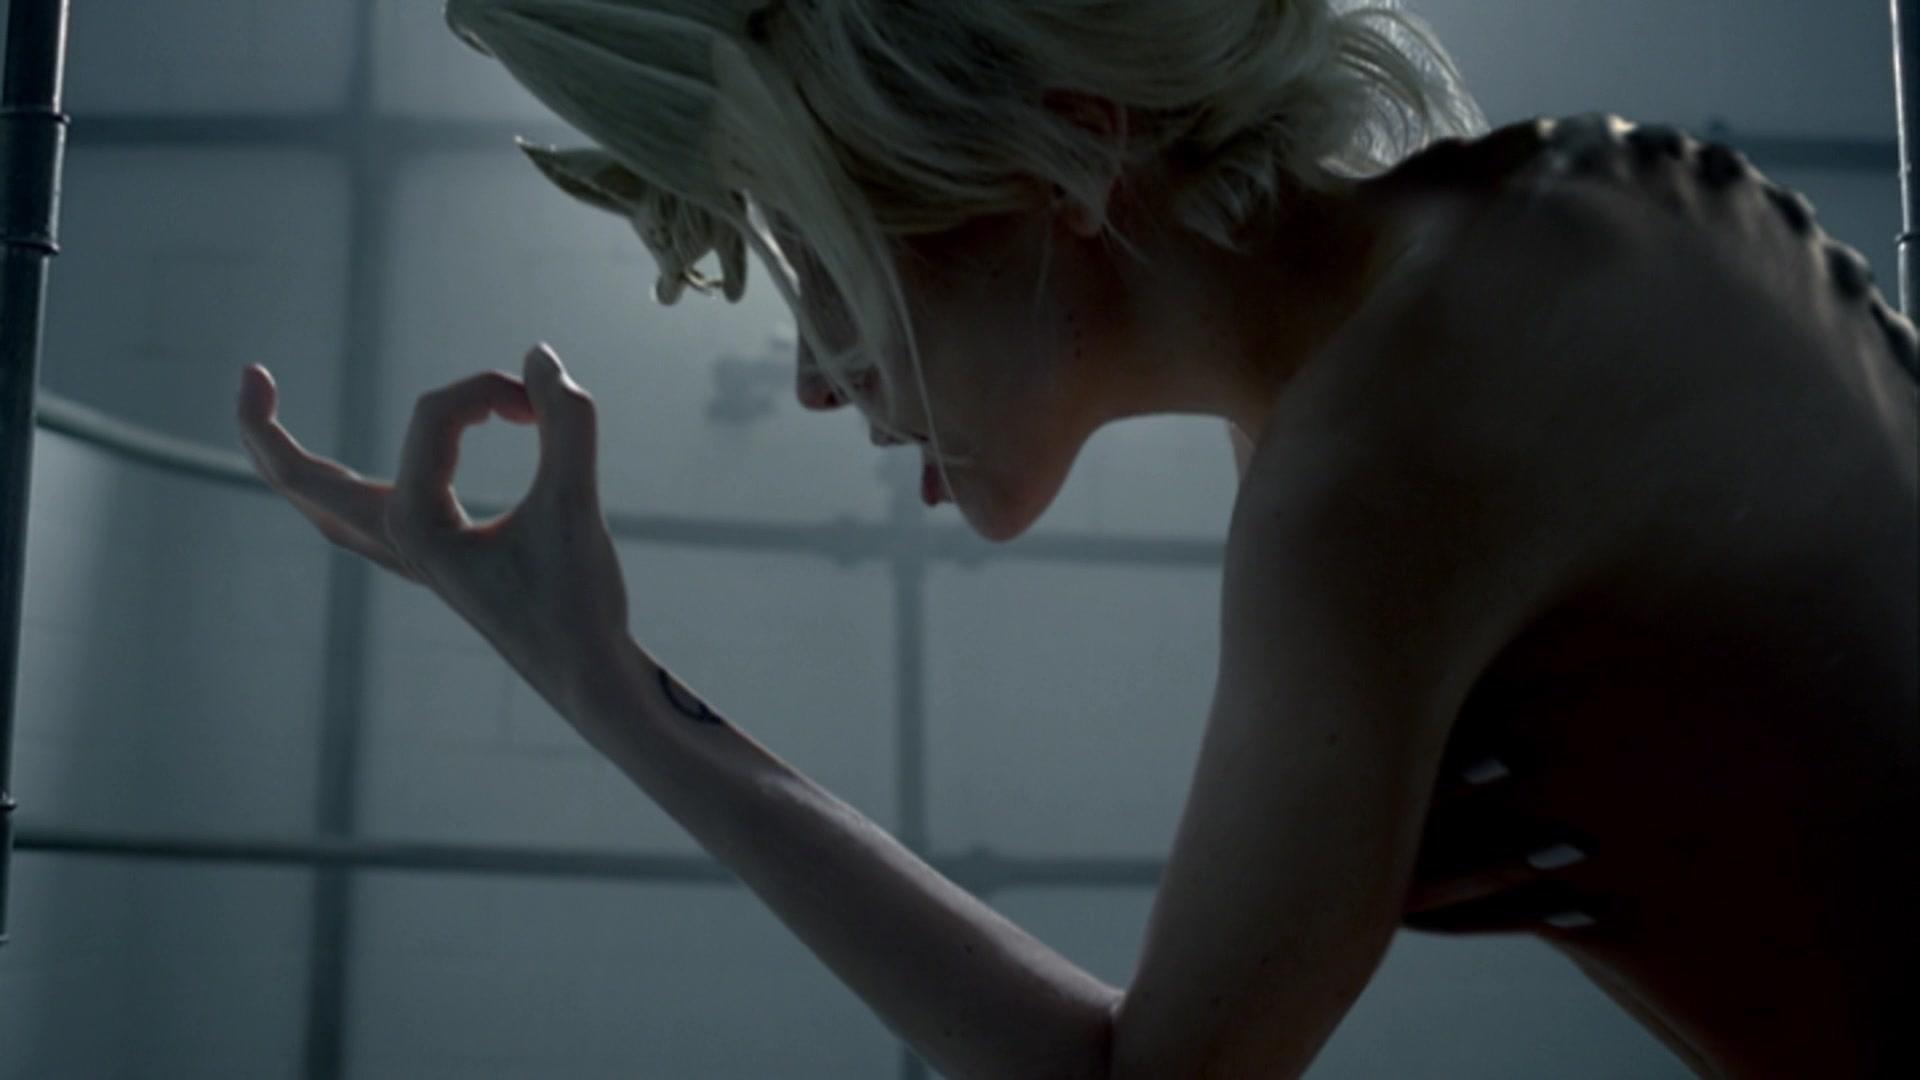 File:Lady Gaga - Bad Romance 020.jpg